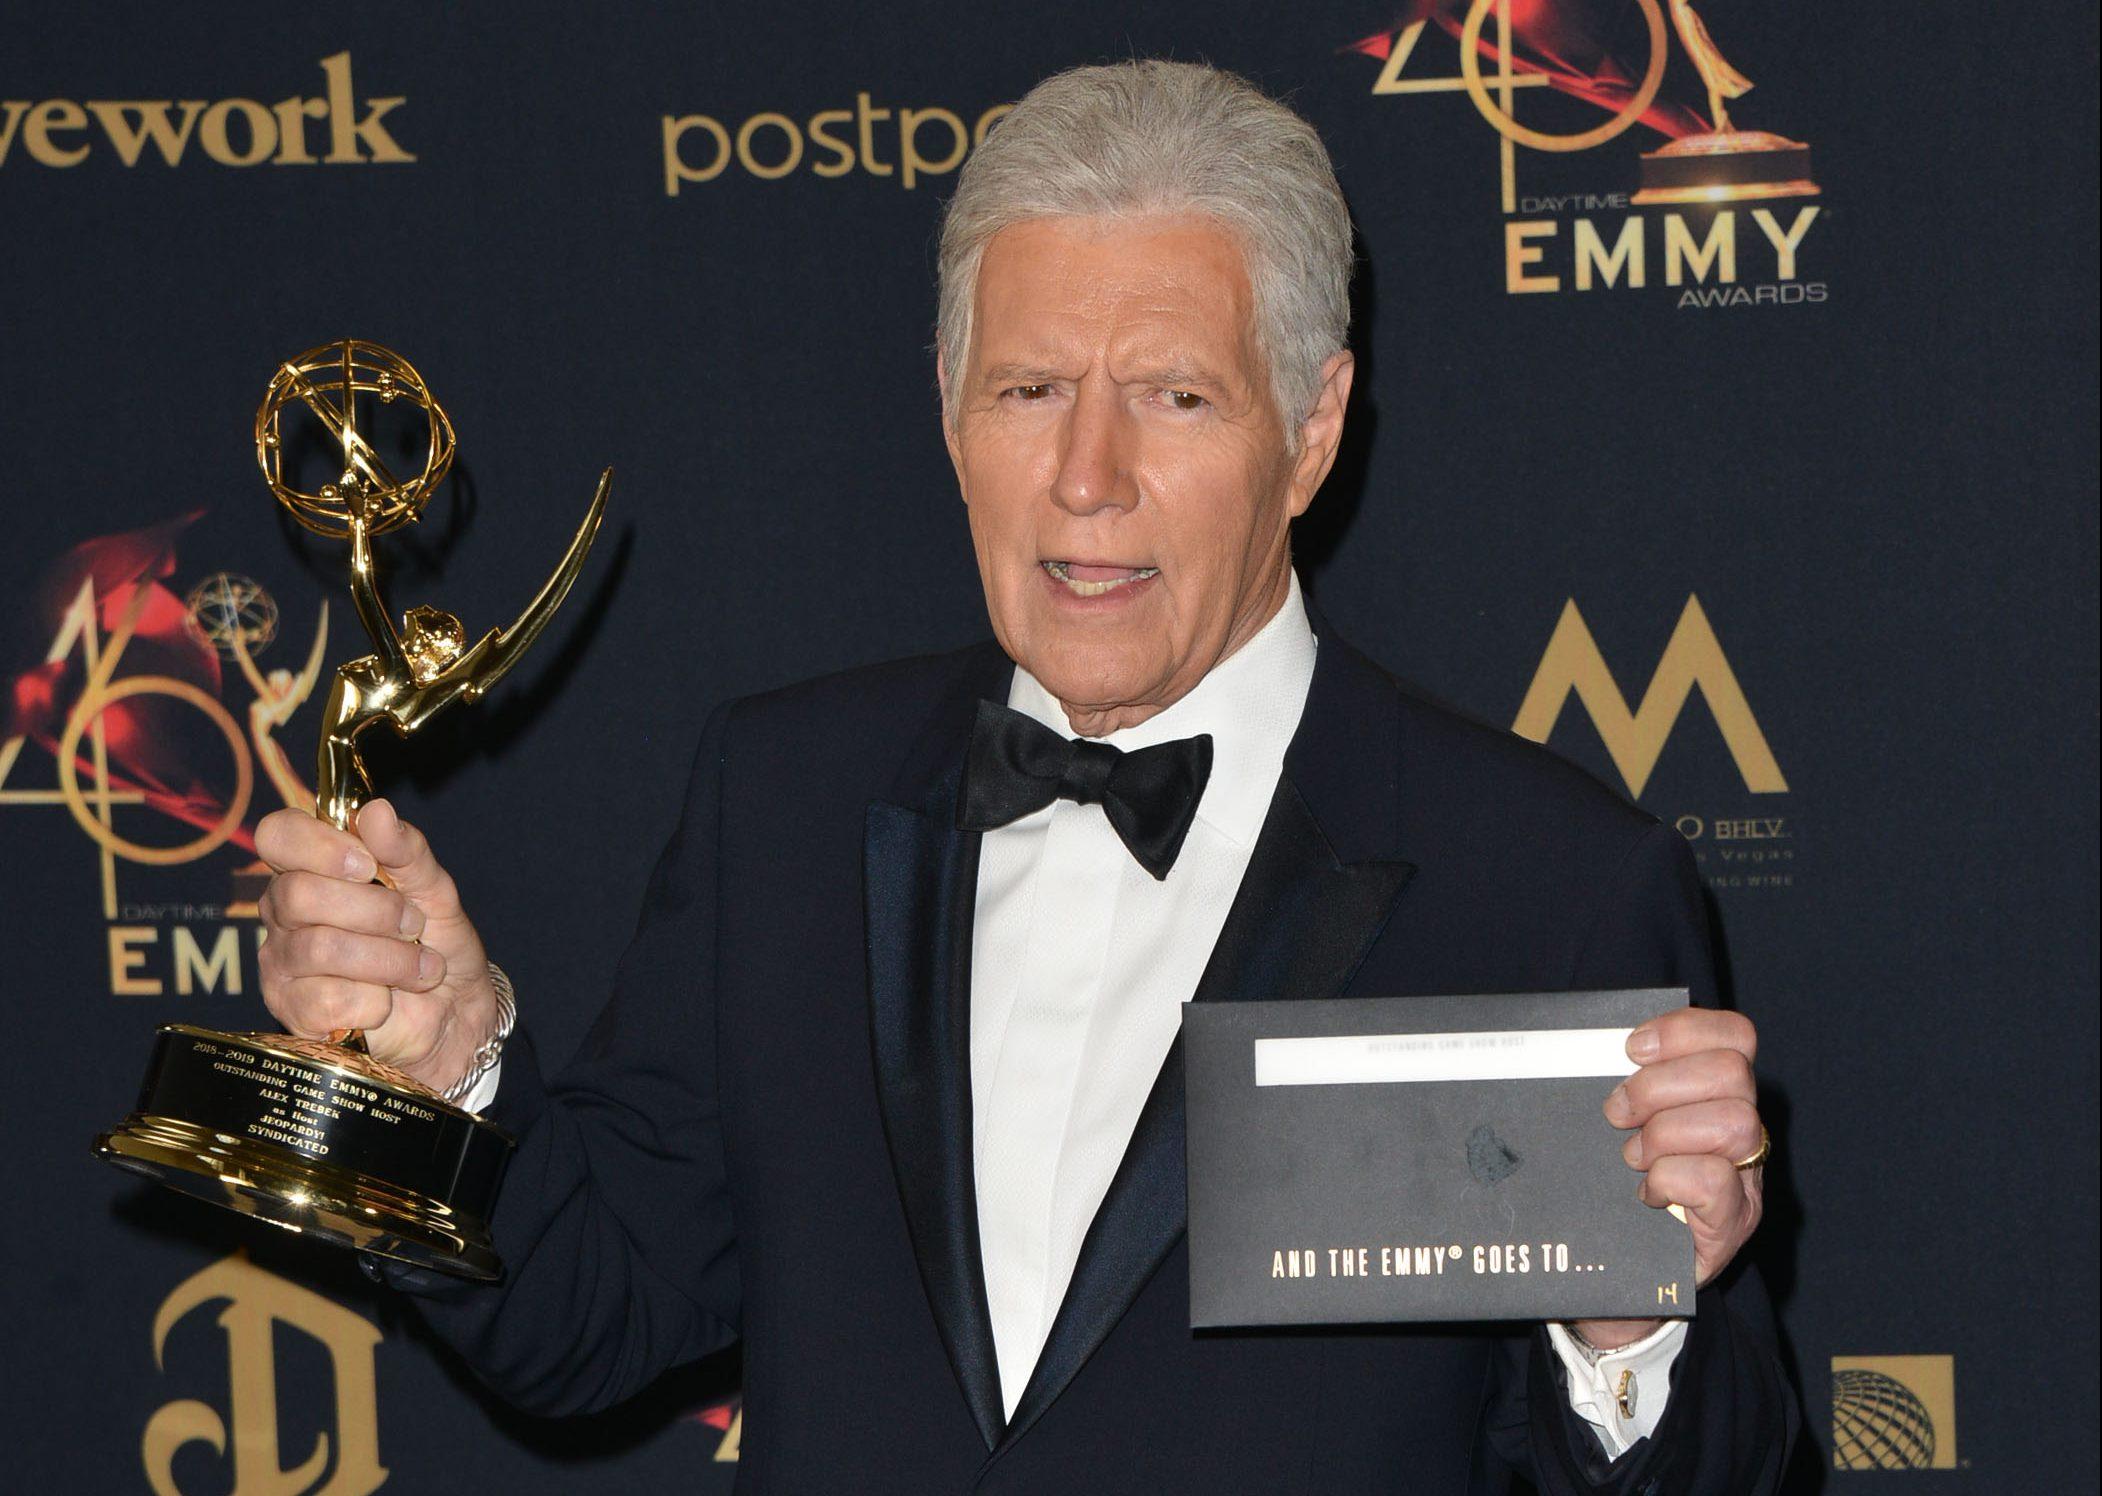 Alex Trebek at the Daytime Emmy Awards